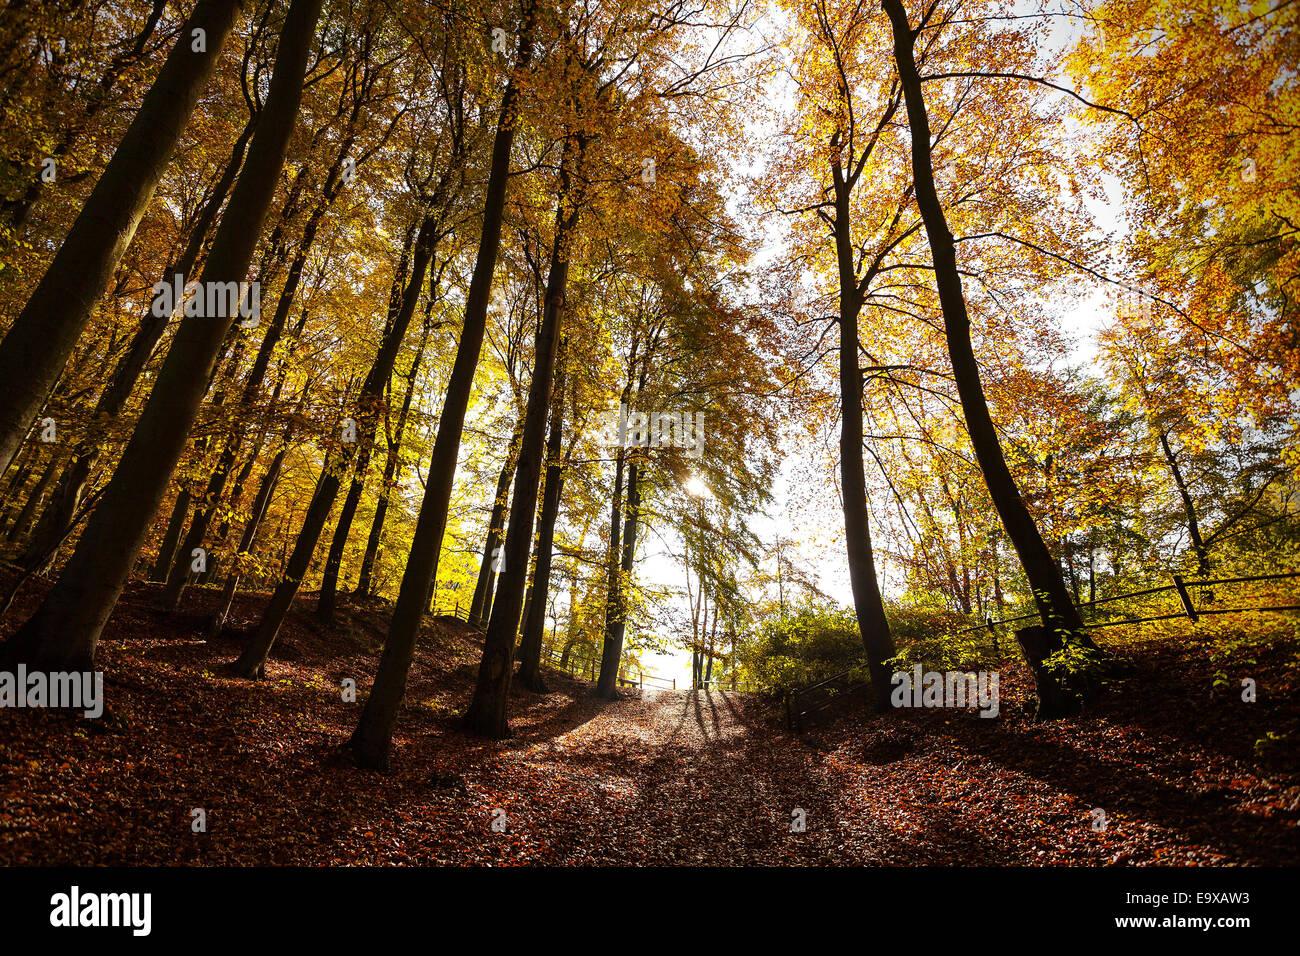 Misterioso paisaje de bosque de otoño. Imagen De Stock